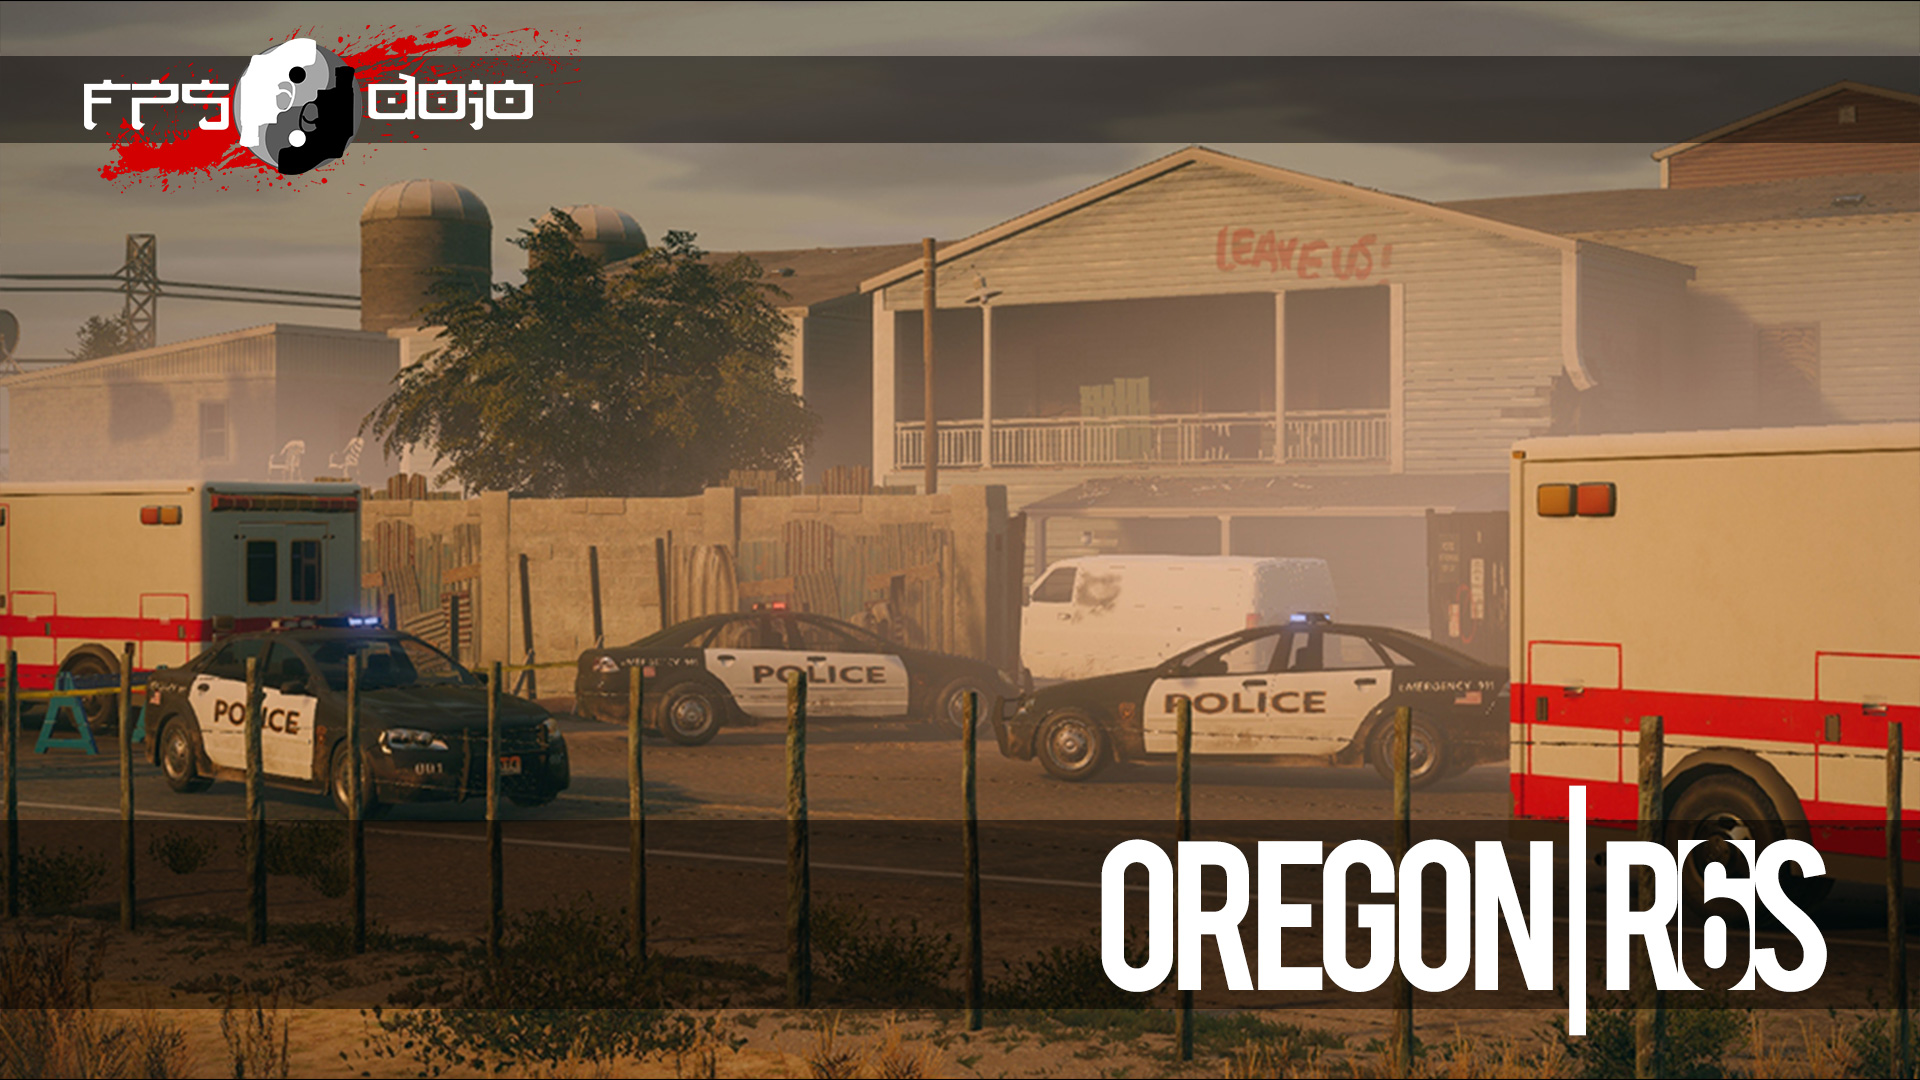 R6S: Oregon